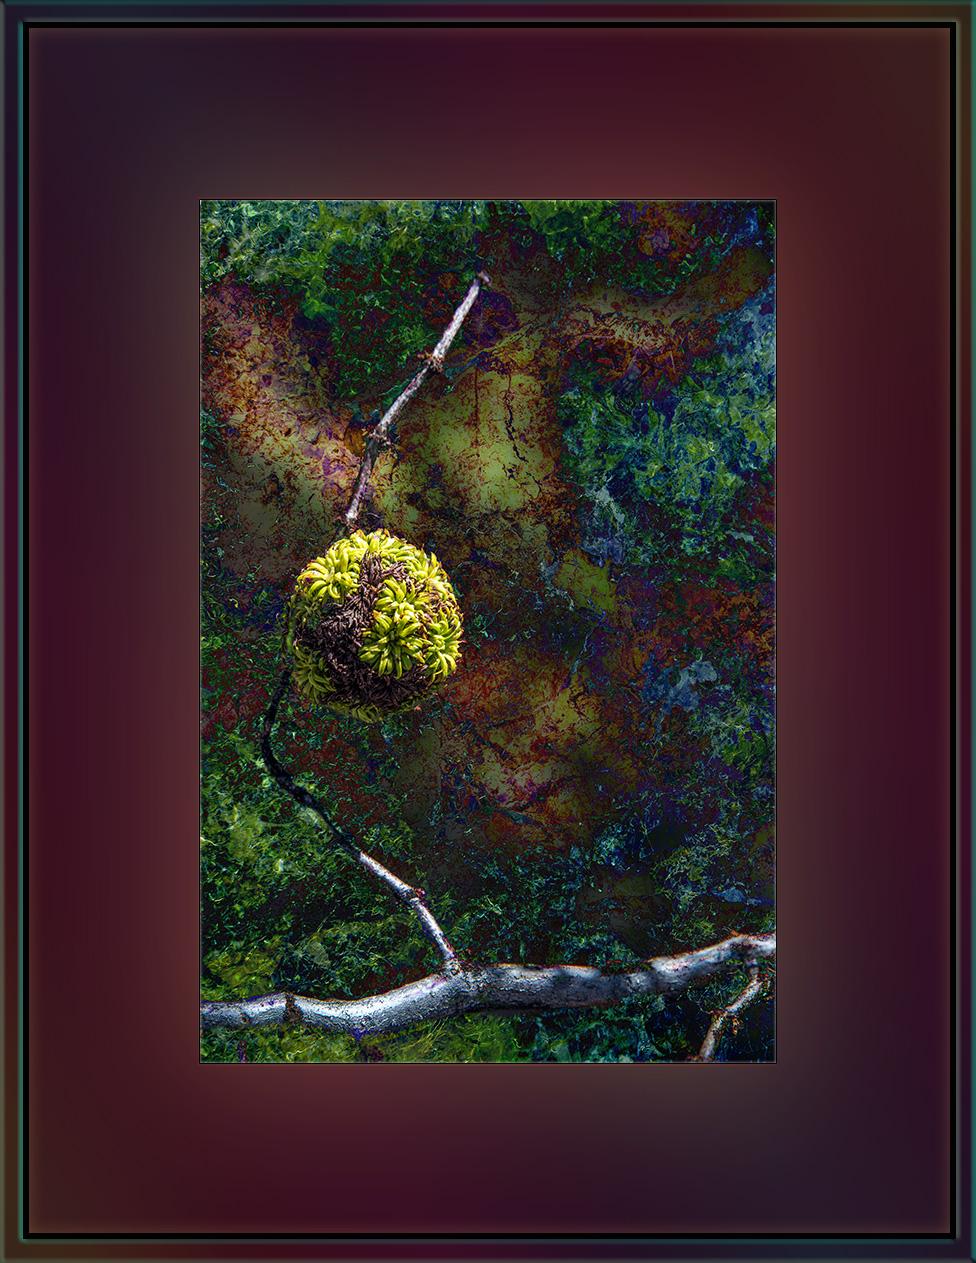 Gall Art (1 of 1) blog